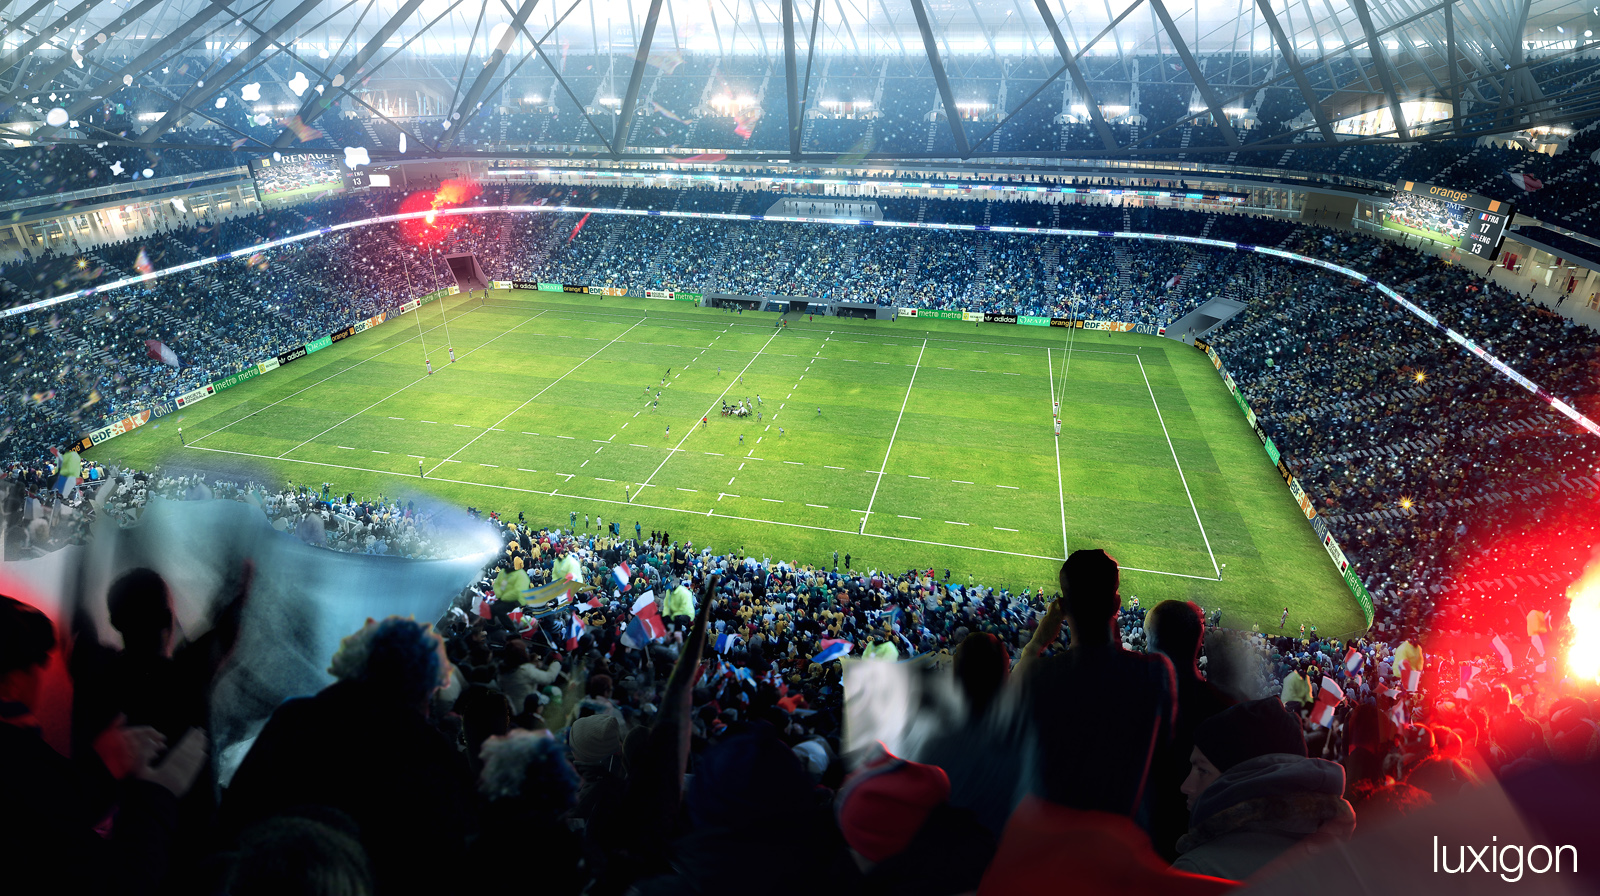 POPULOUS - Grand Stade FFR - Evry, FR